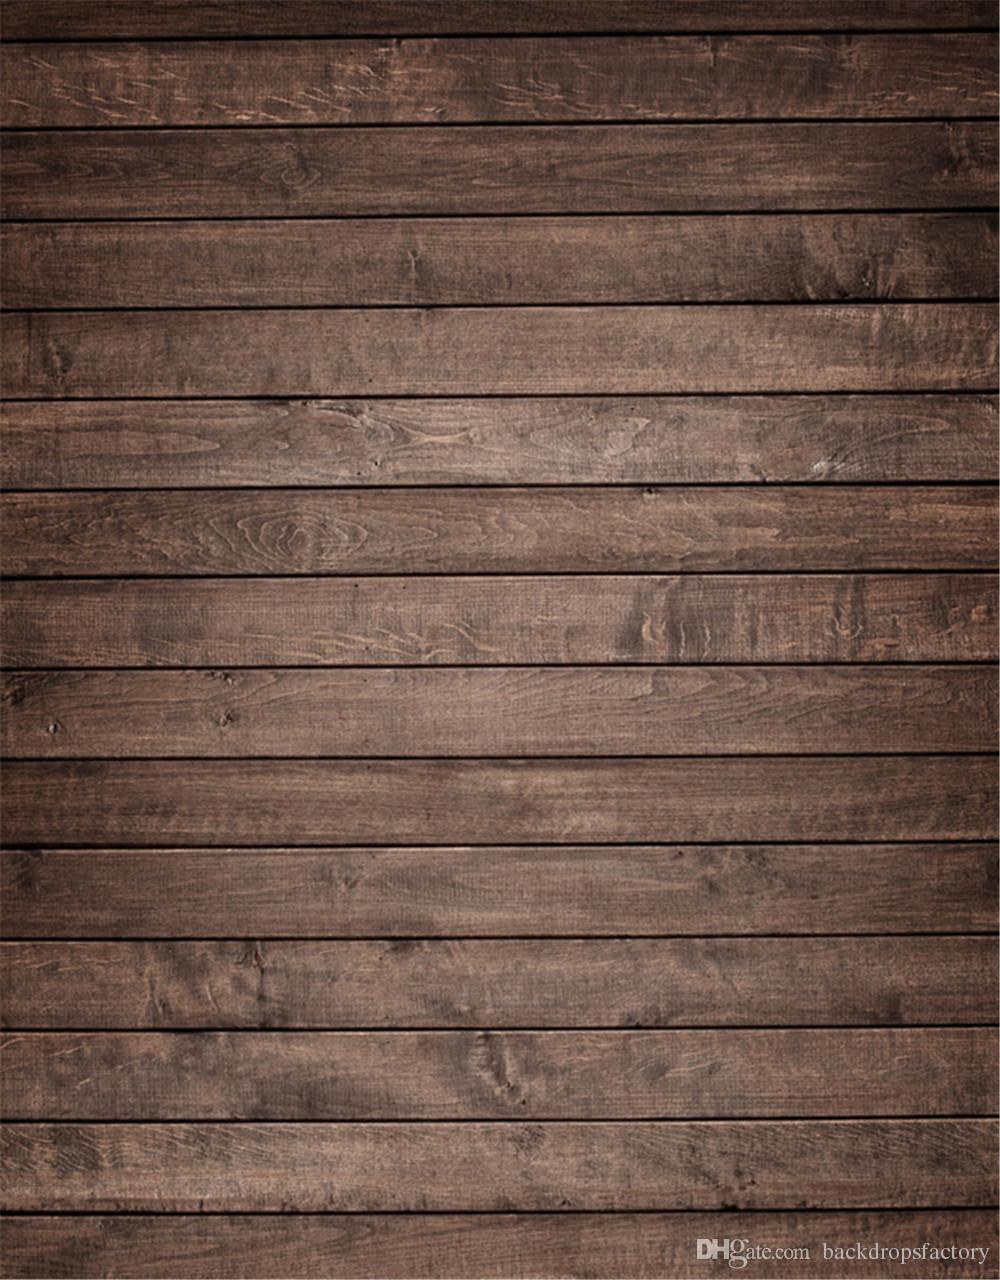 2018 Vintage Dark Brown Wood Planks Vinyl Backdrops For